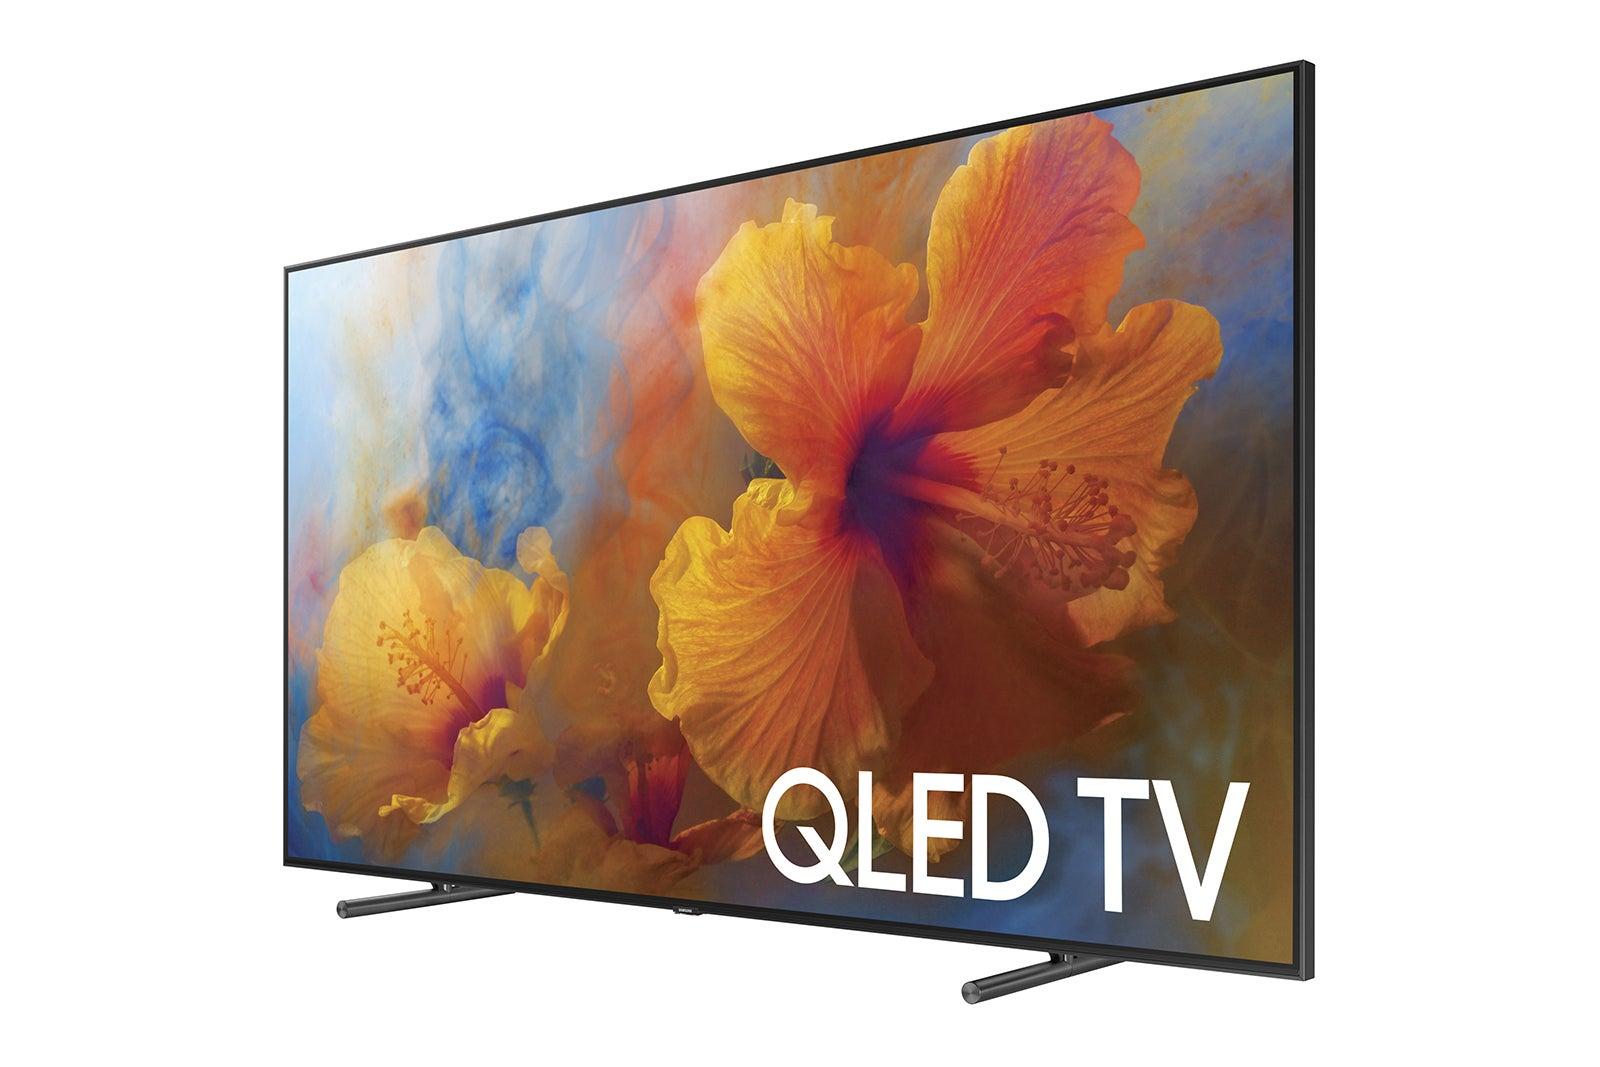 Samsung Q9F series QLED smart TV review: Samsung's best 4K UHD TV